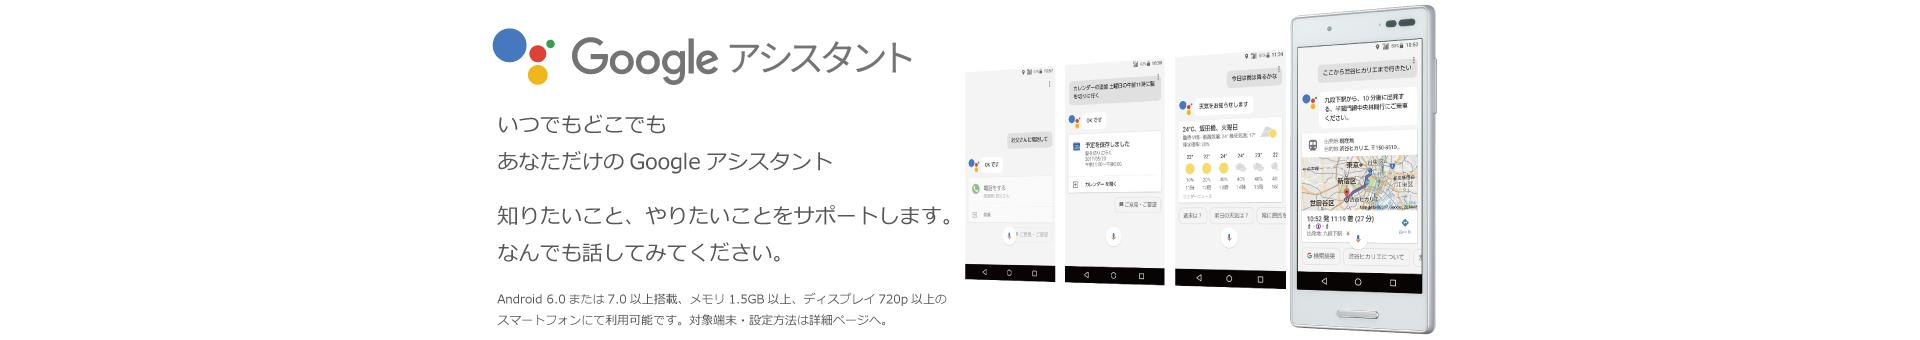 Google アシスタント